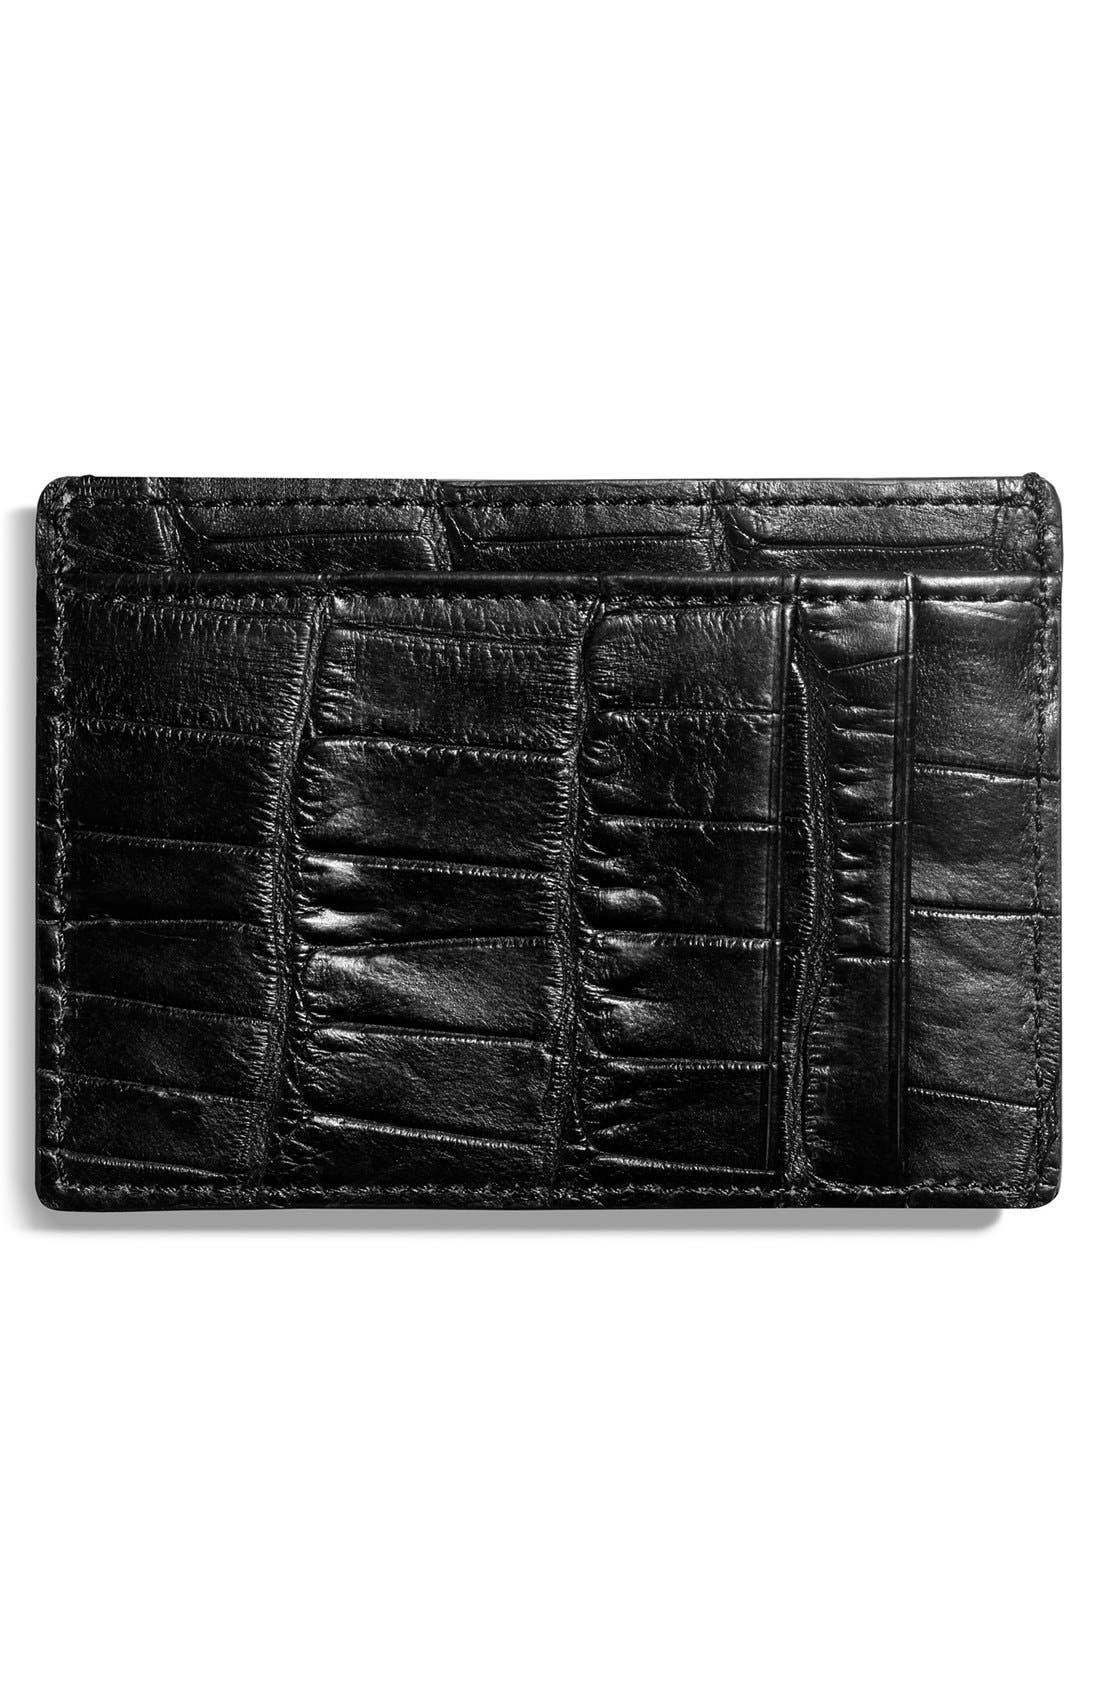 Shinola Alligator Leather Card Case